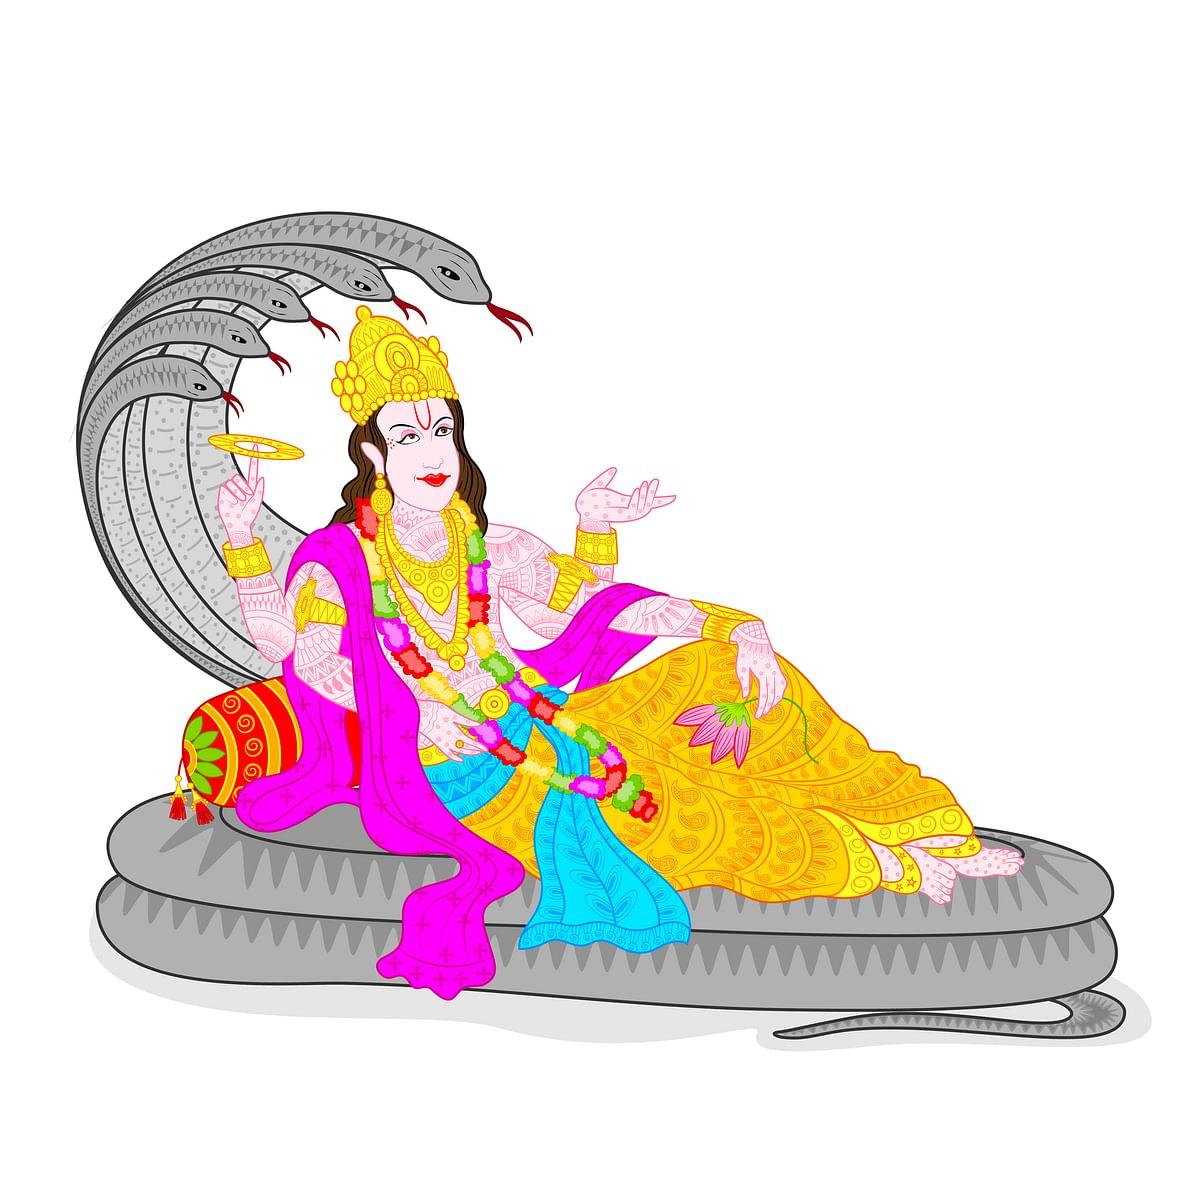 रमा एकादशी व्रत विधि- Rama Ekadashi Vrat Vidhi in Hindi